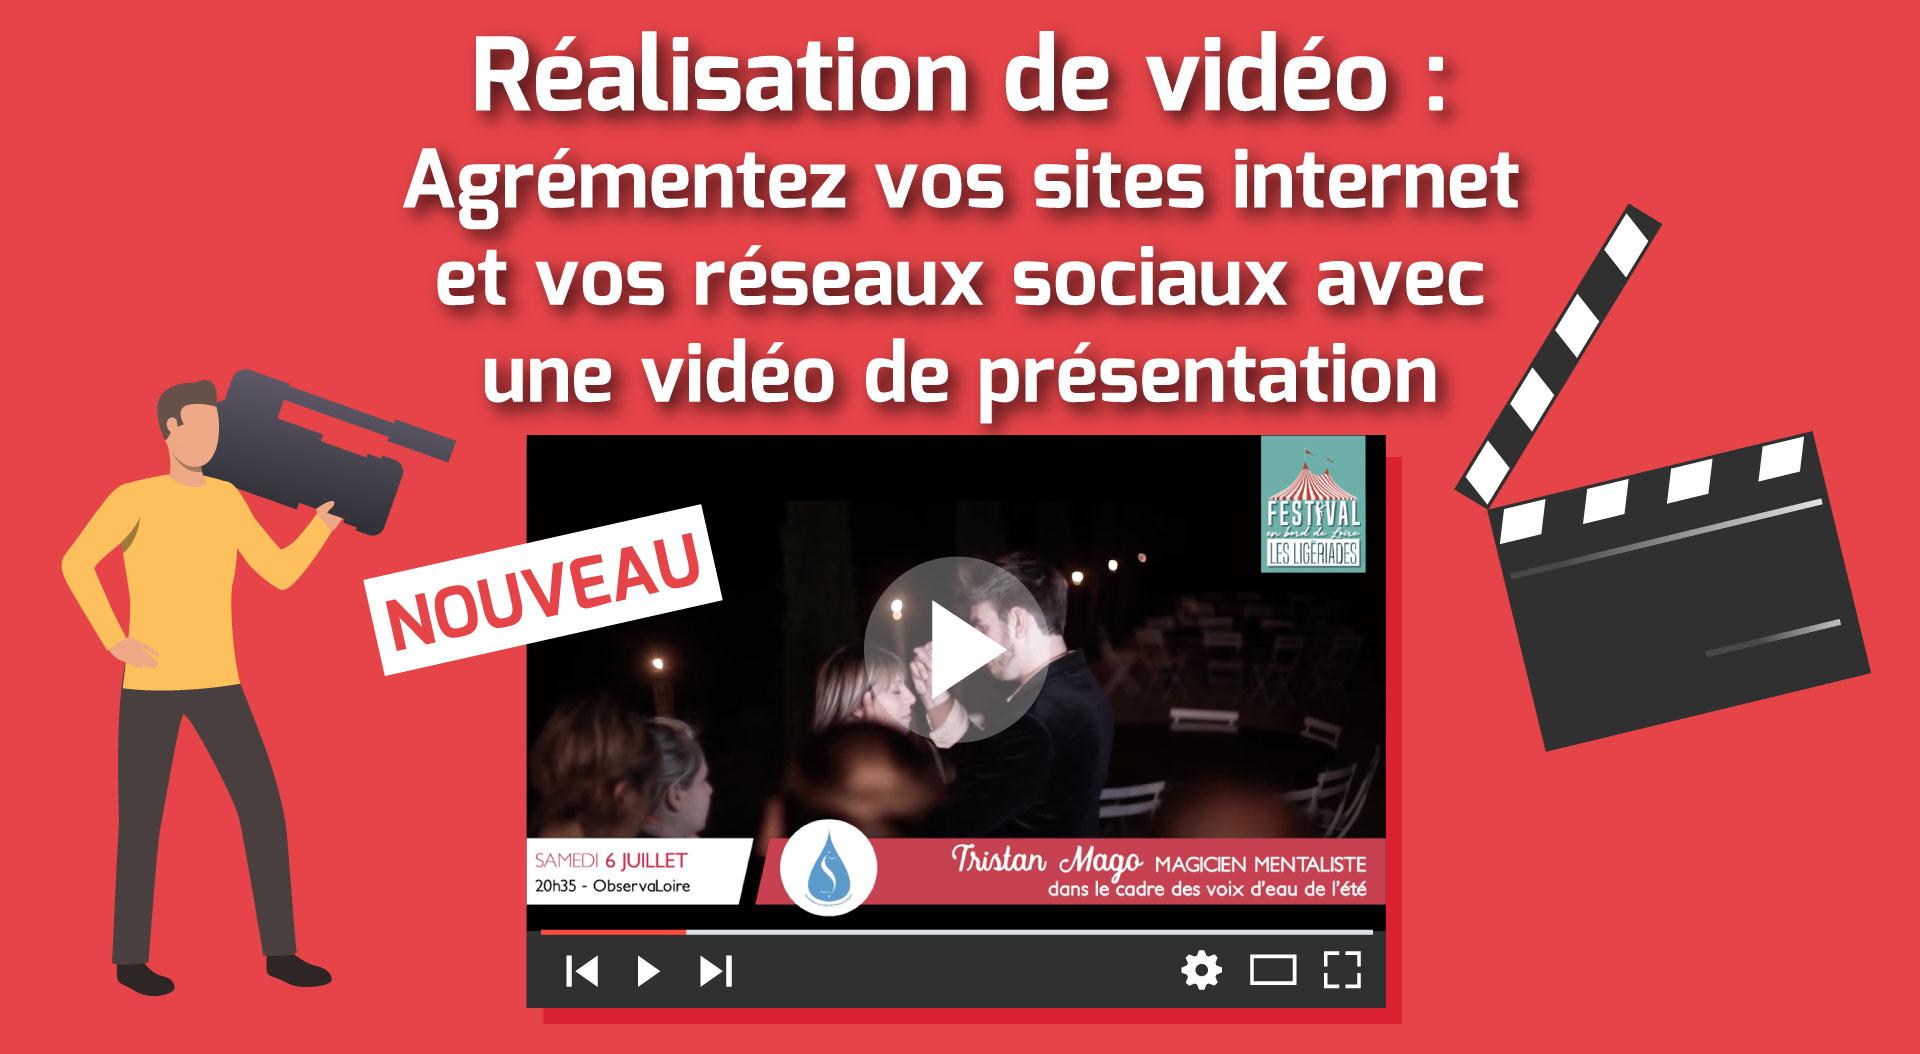 11_realisation_video_1920x1054